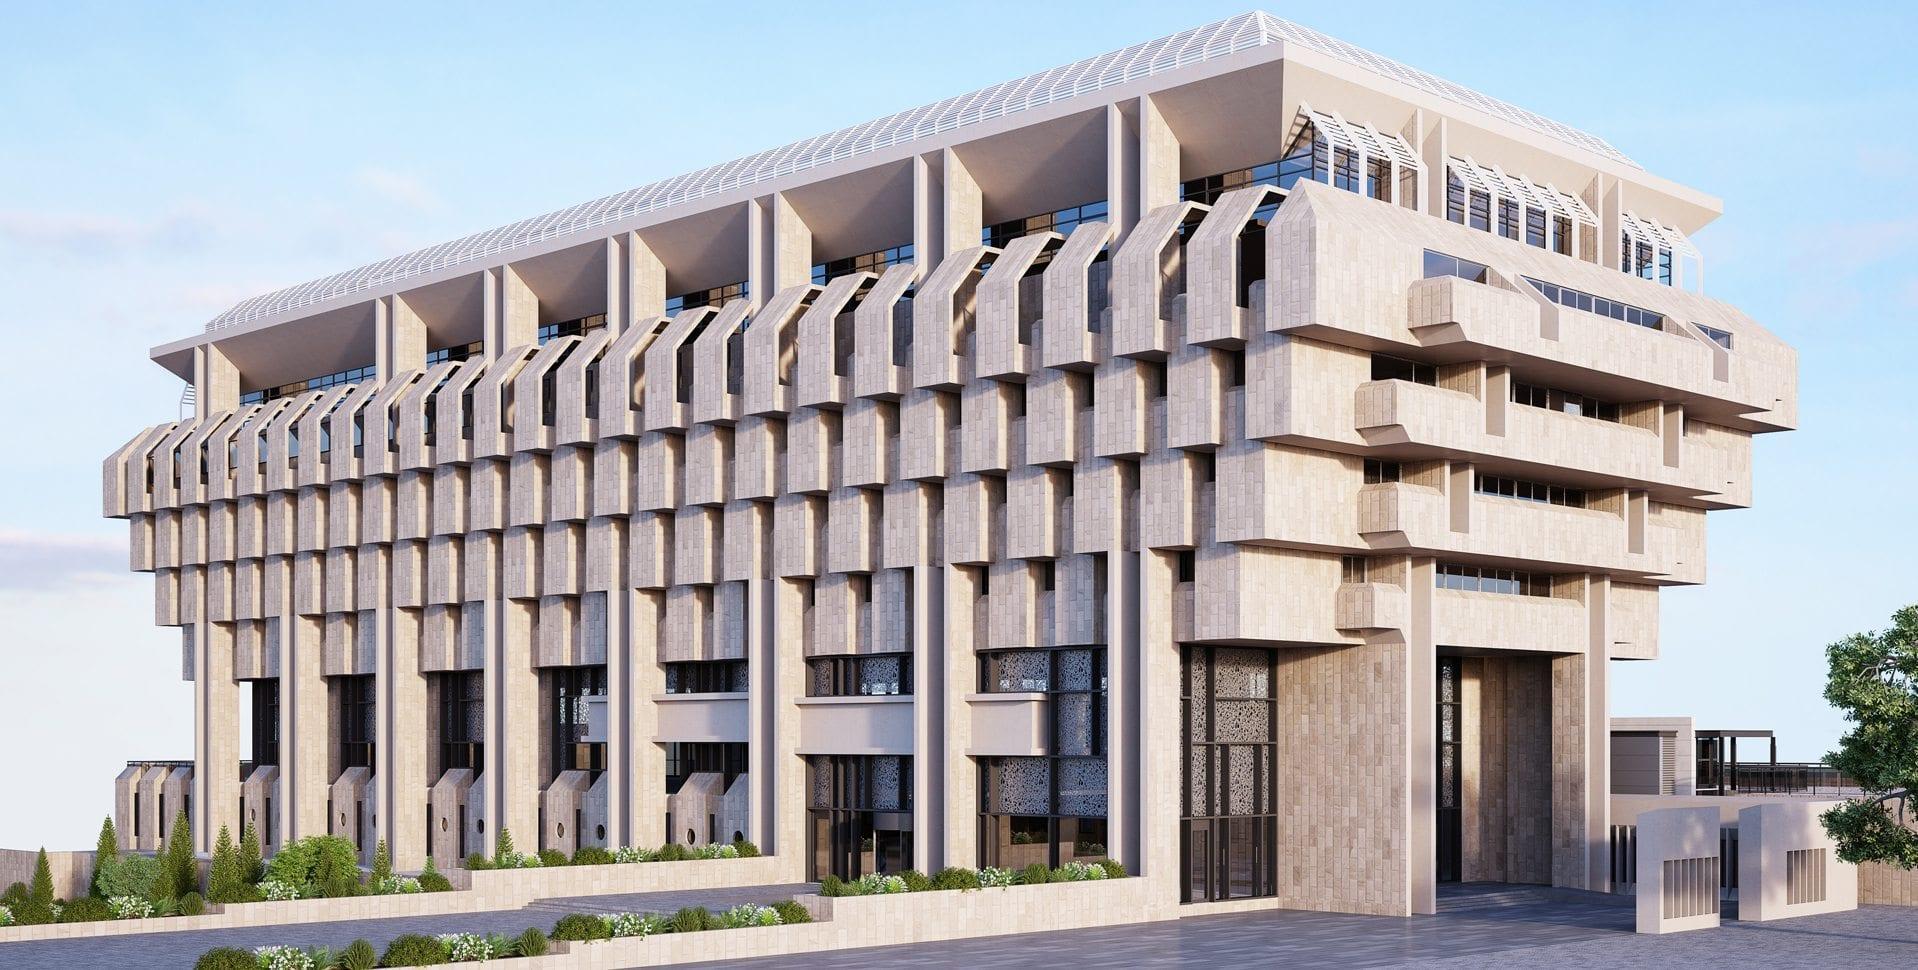 Maayan-Golan_Architectural-Visualization_exterior-visualization_bank-of-israel-jerusalem_front-elevation_dunski-architects_01